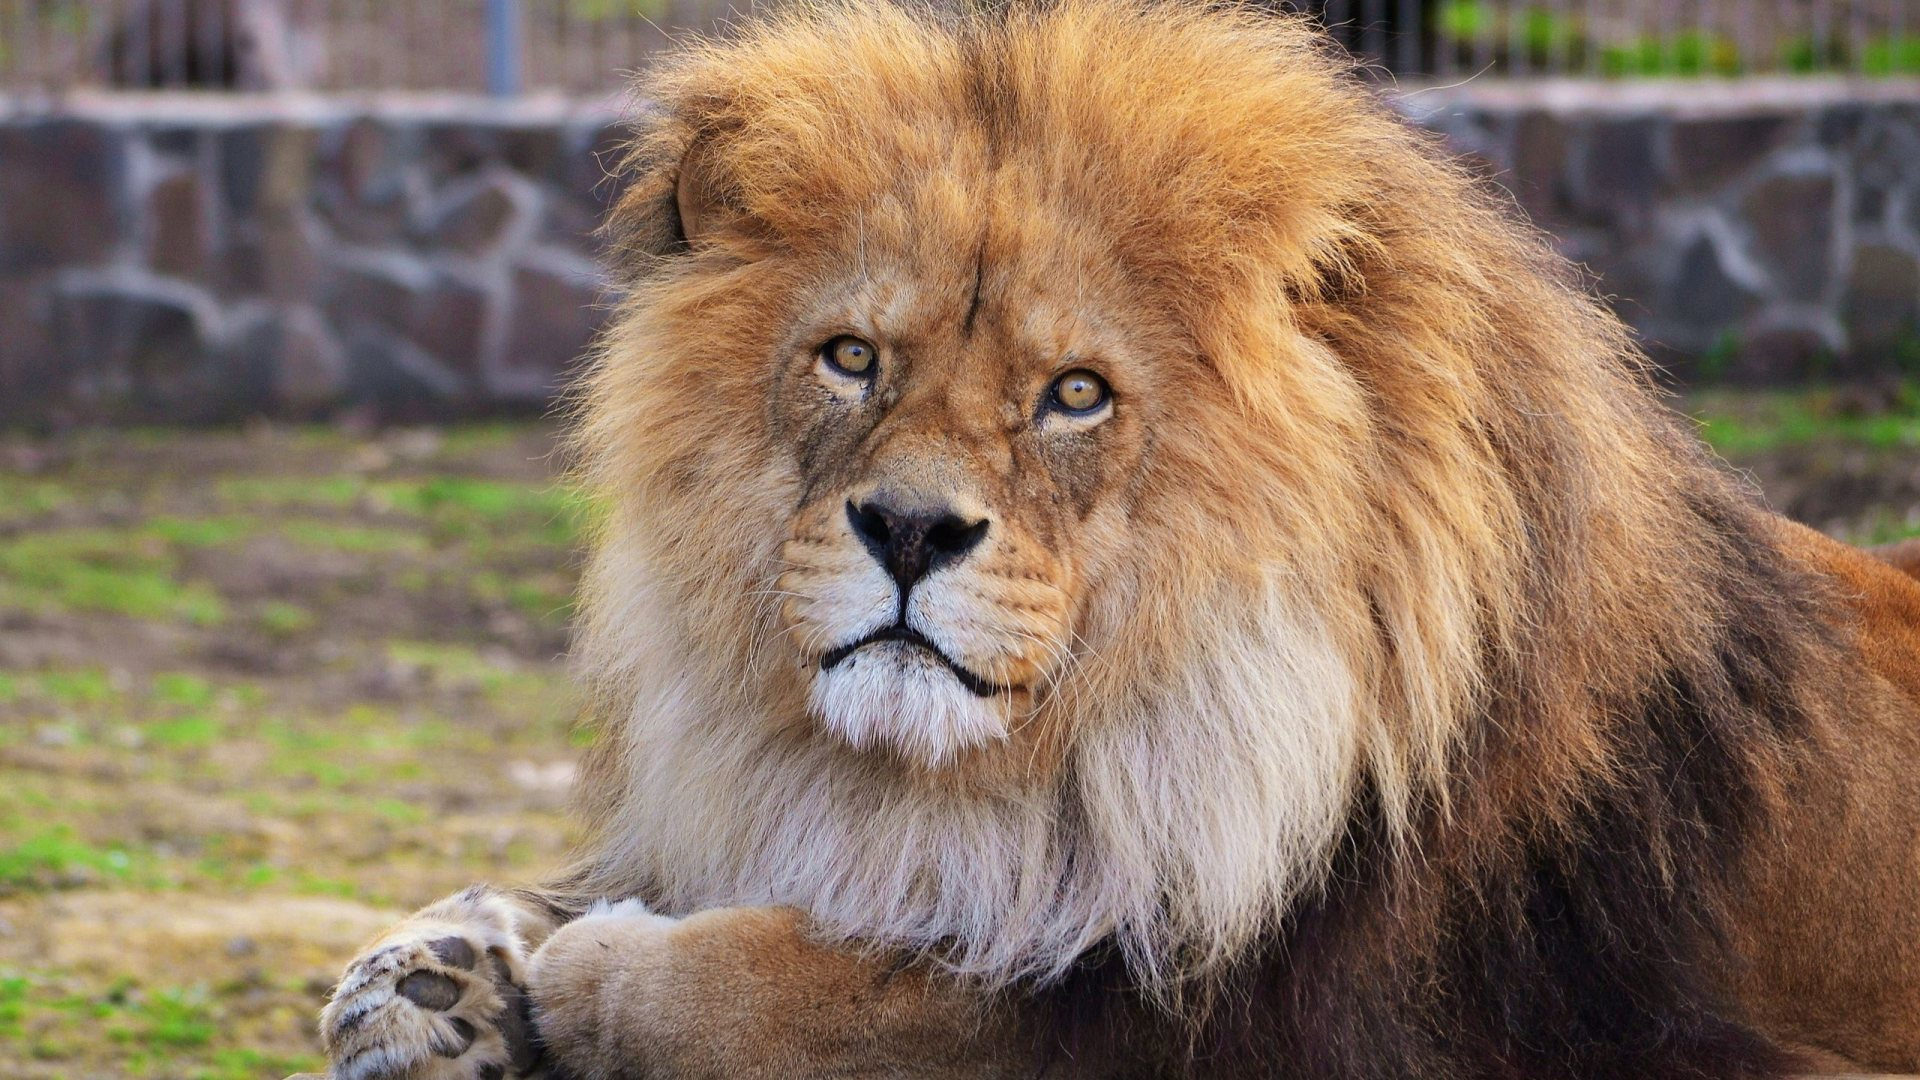 44+ Lion Wallpaper HD 1080P on WallpaperSafari